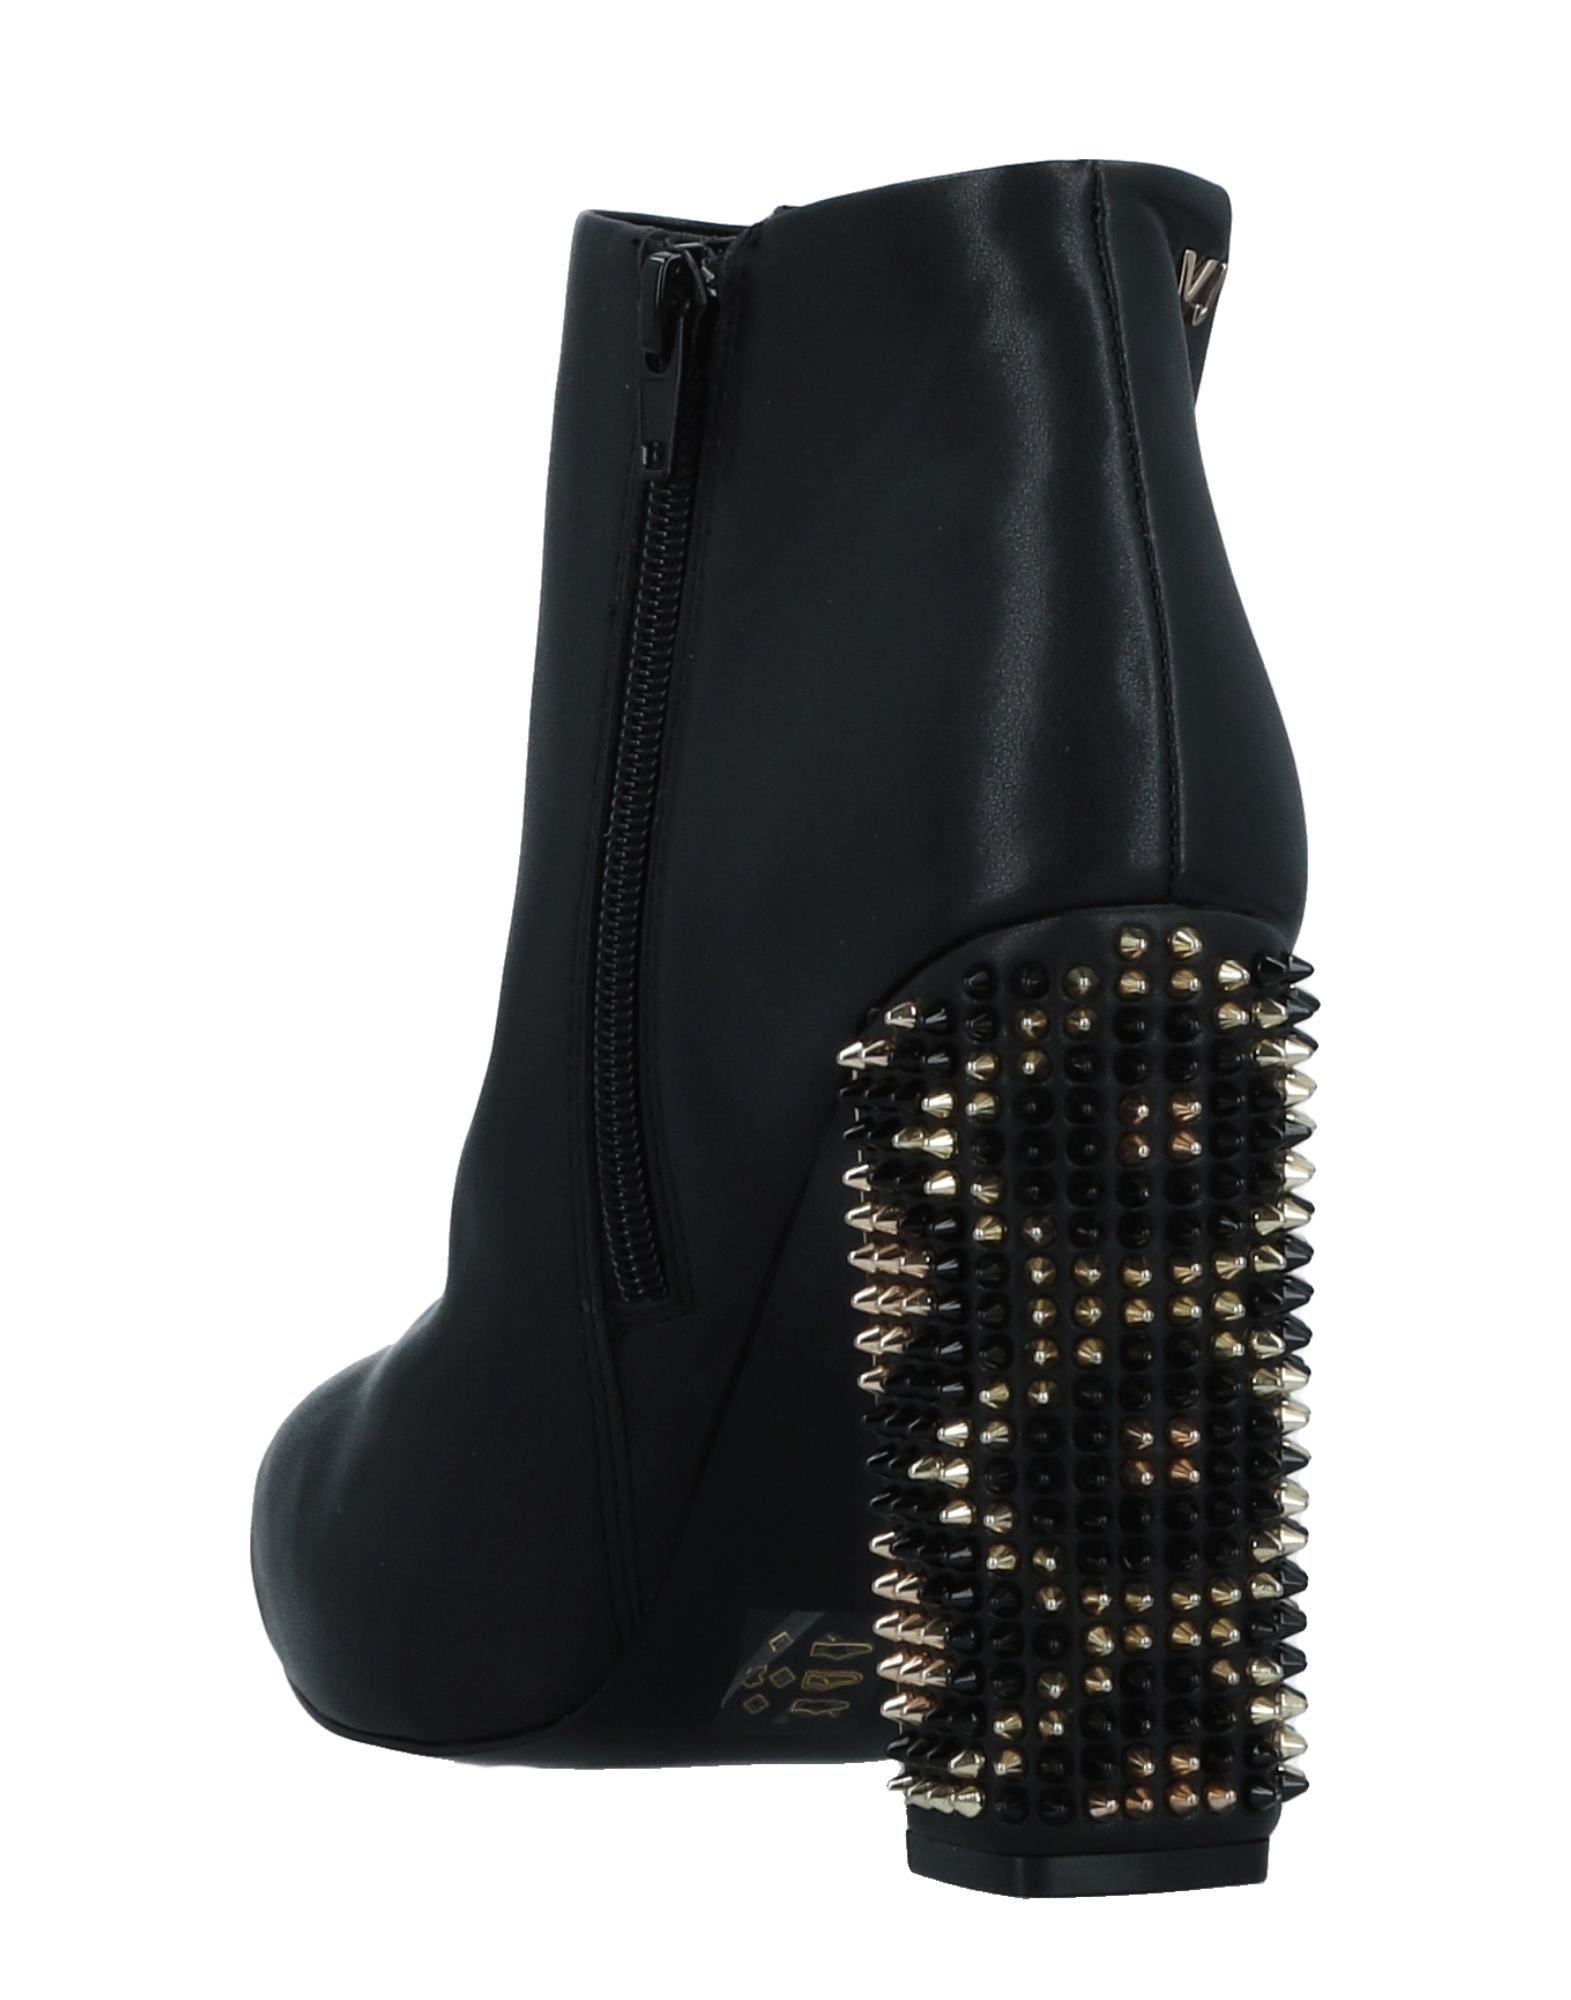 Versace Jeans Stiefelette Damen Gutes Preis-Leistungs-Verhältnis, es es Preis-Leistungs-Verhältnis, lohnt sich e3eca3